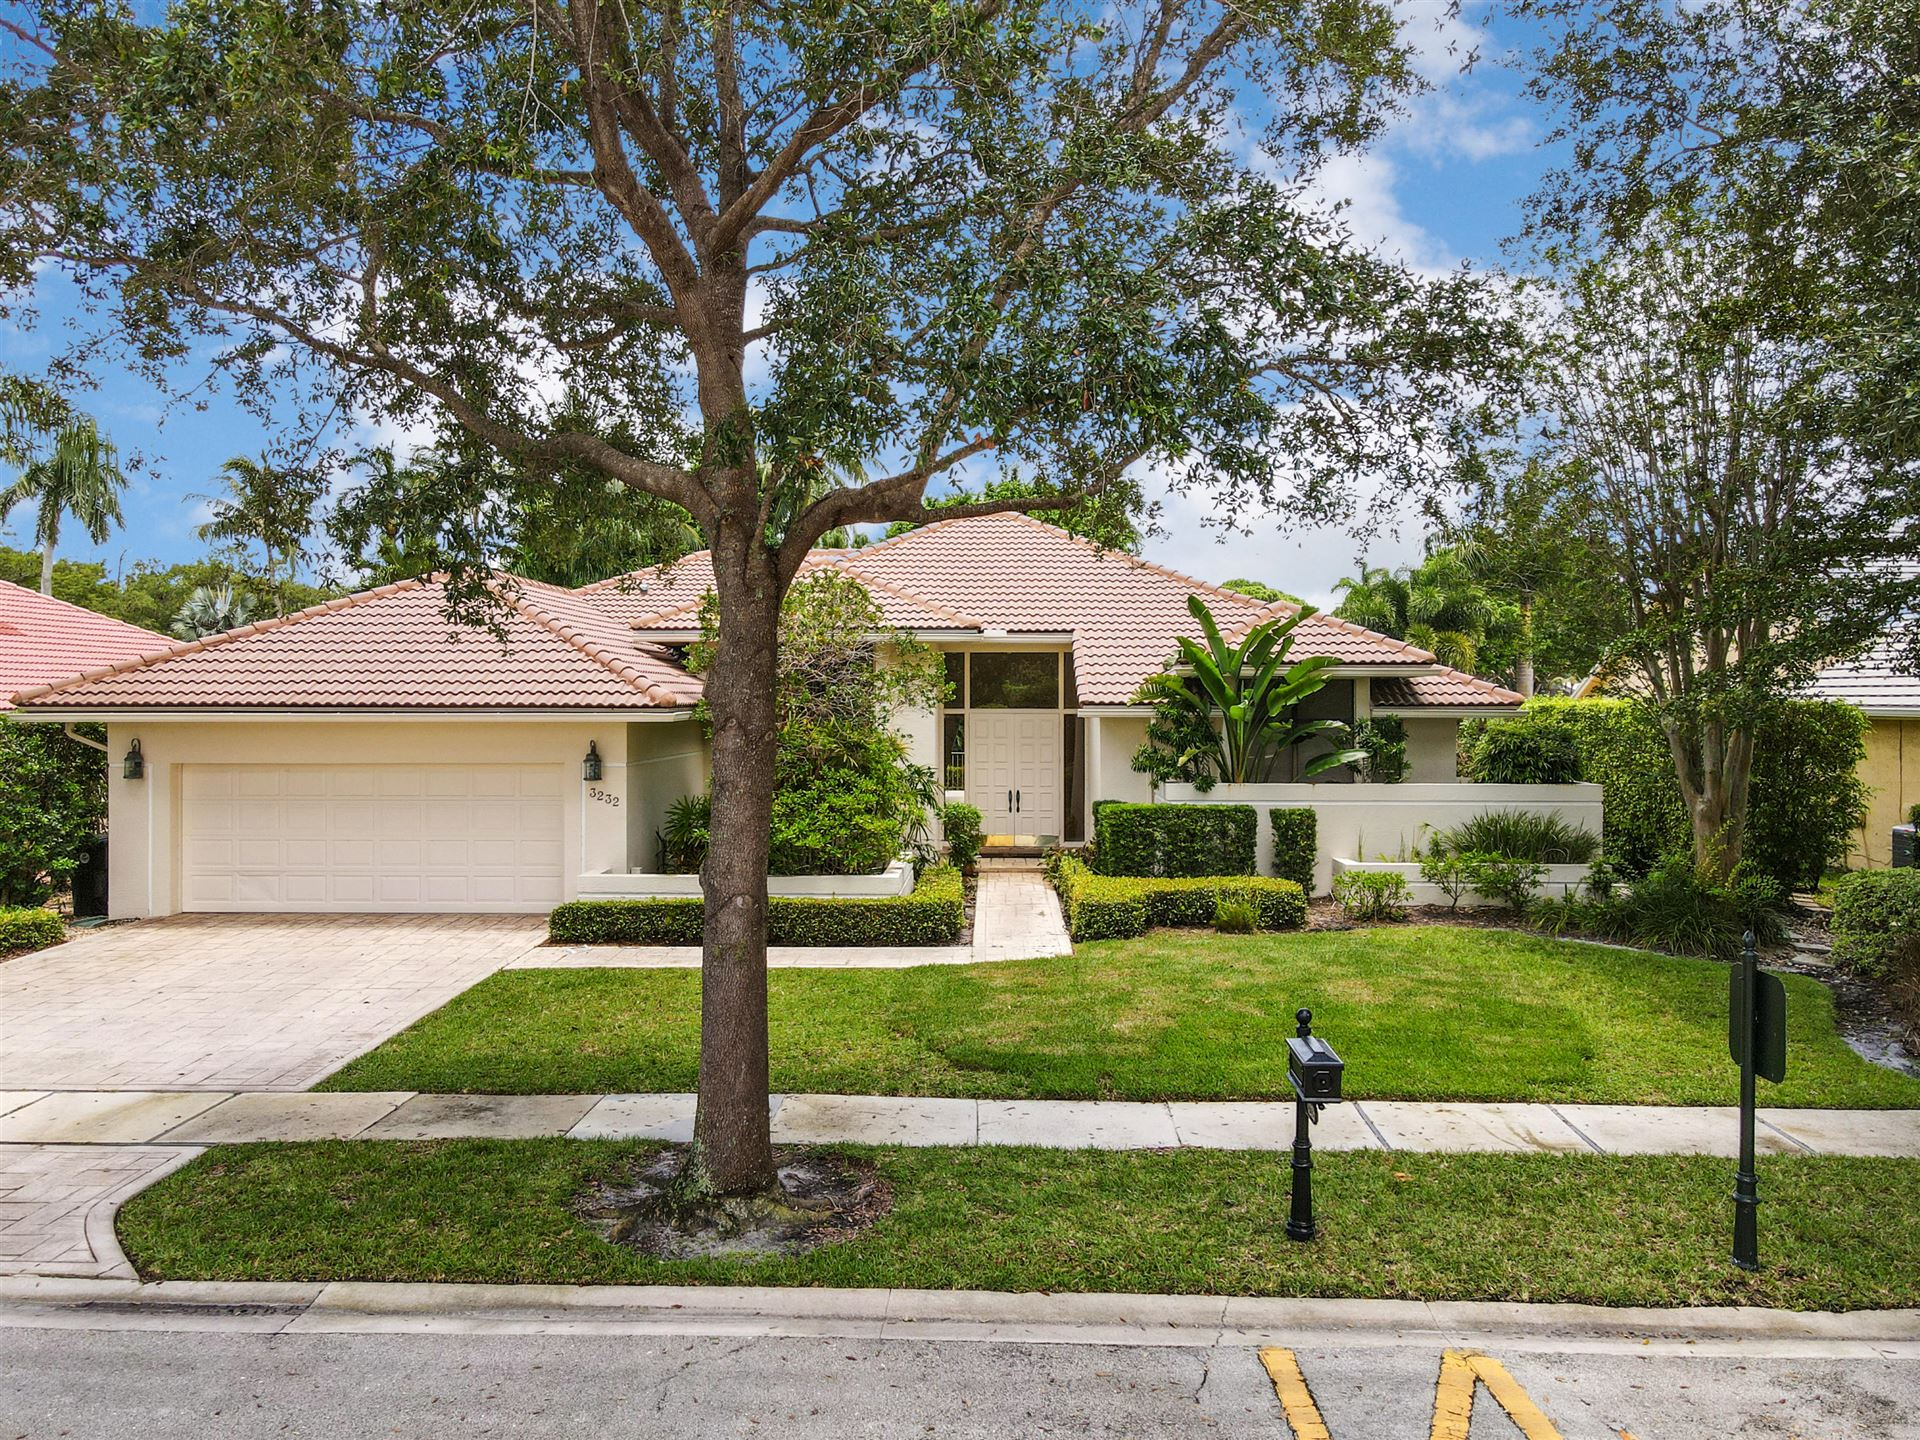 3232 Westminster Drive, Boca Raton, FL 33496 - #: RX-10630514